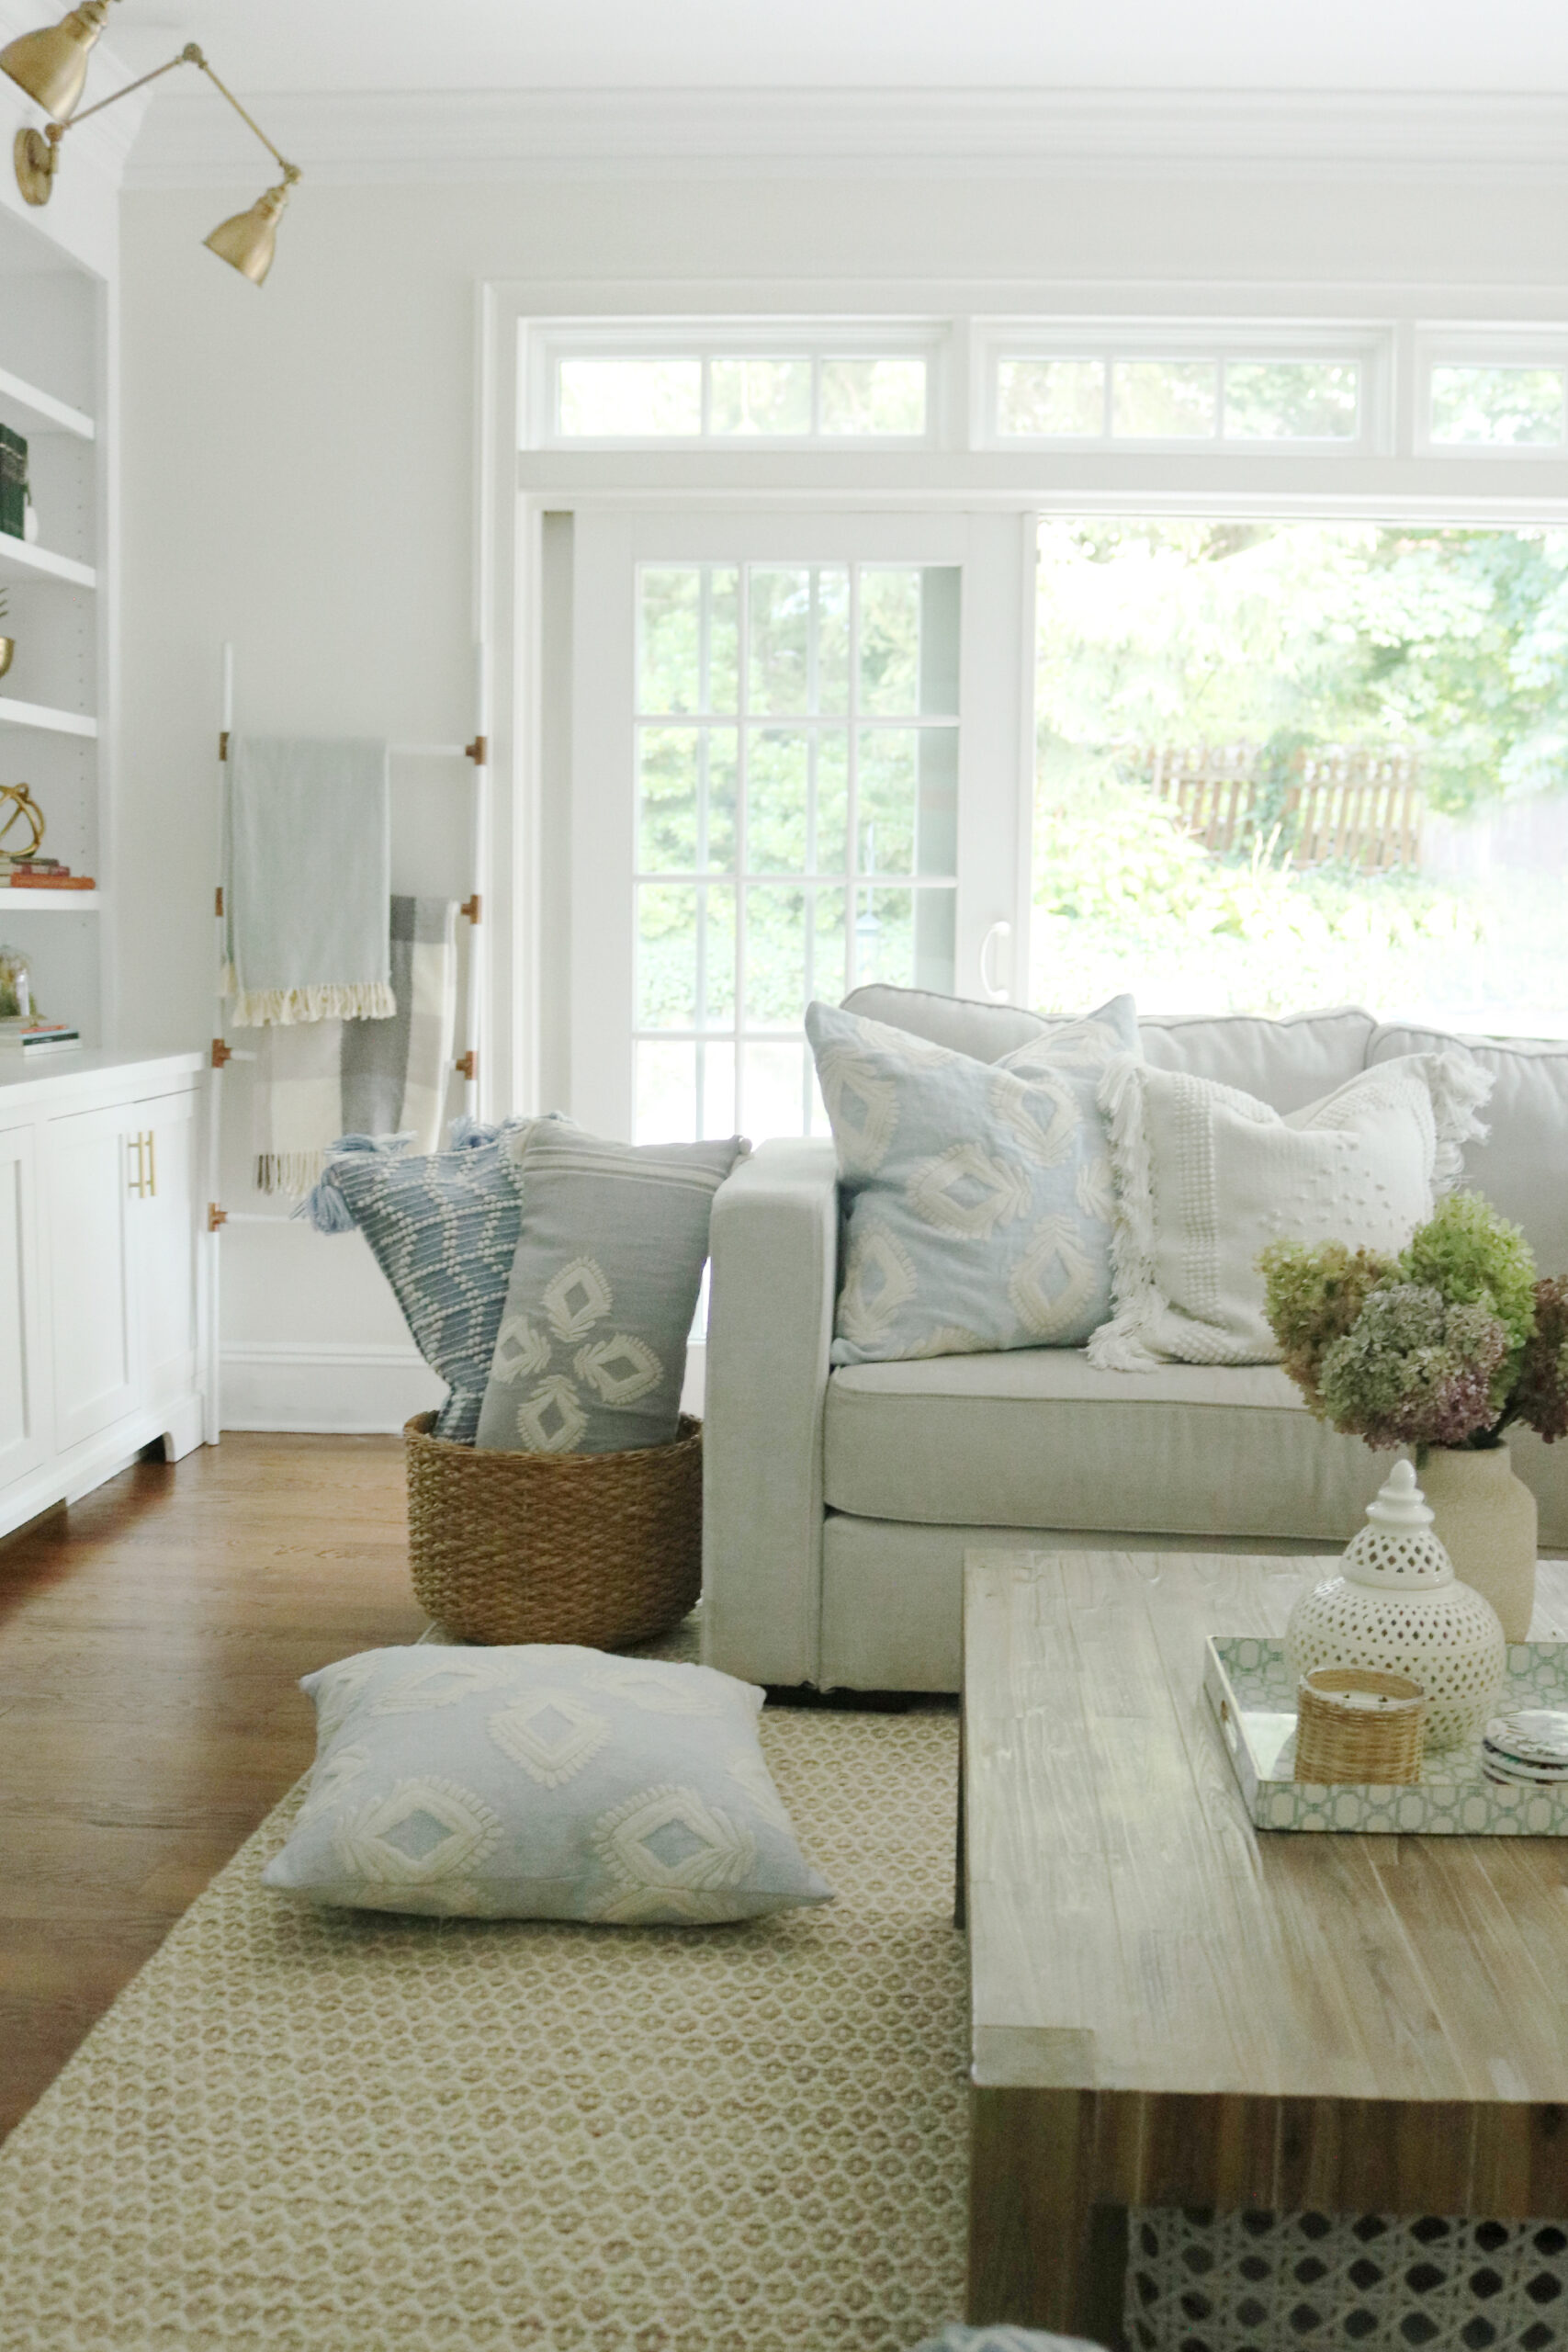 Budget-friendly fall home decor | Darling Darleen Top Lifestyle Blogger  Fall pillows